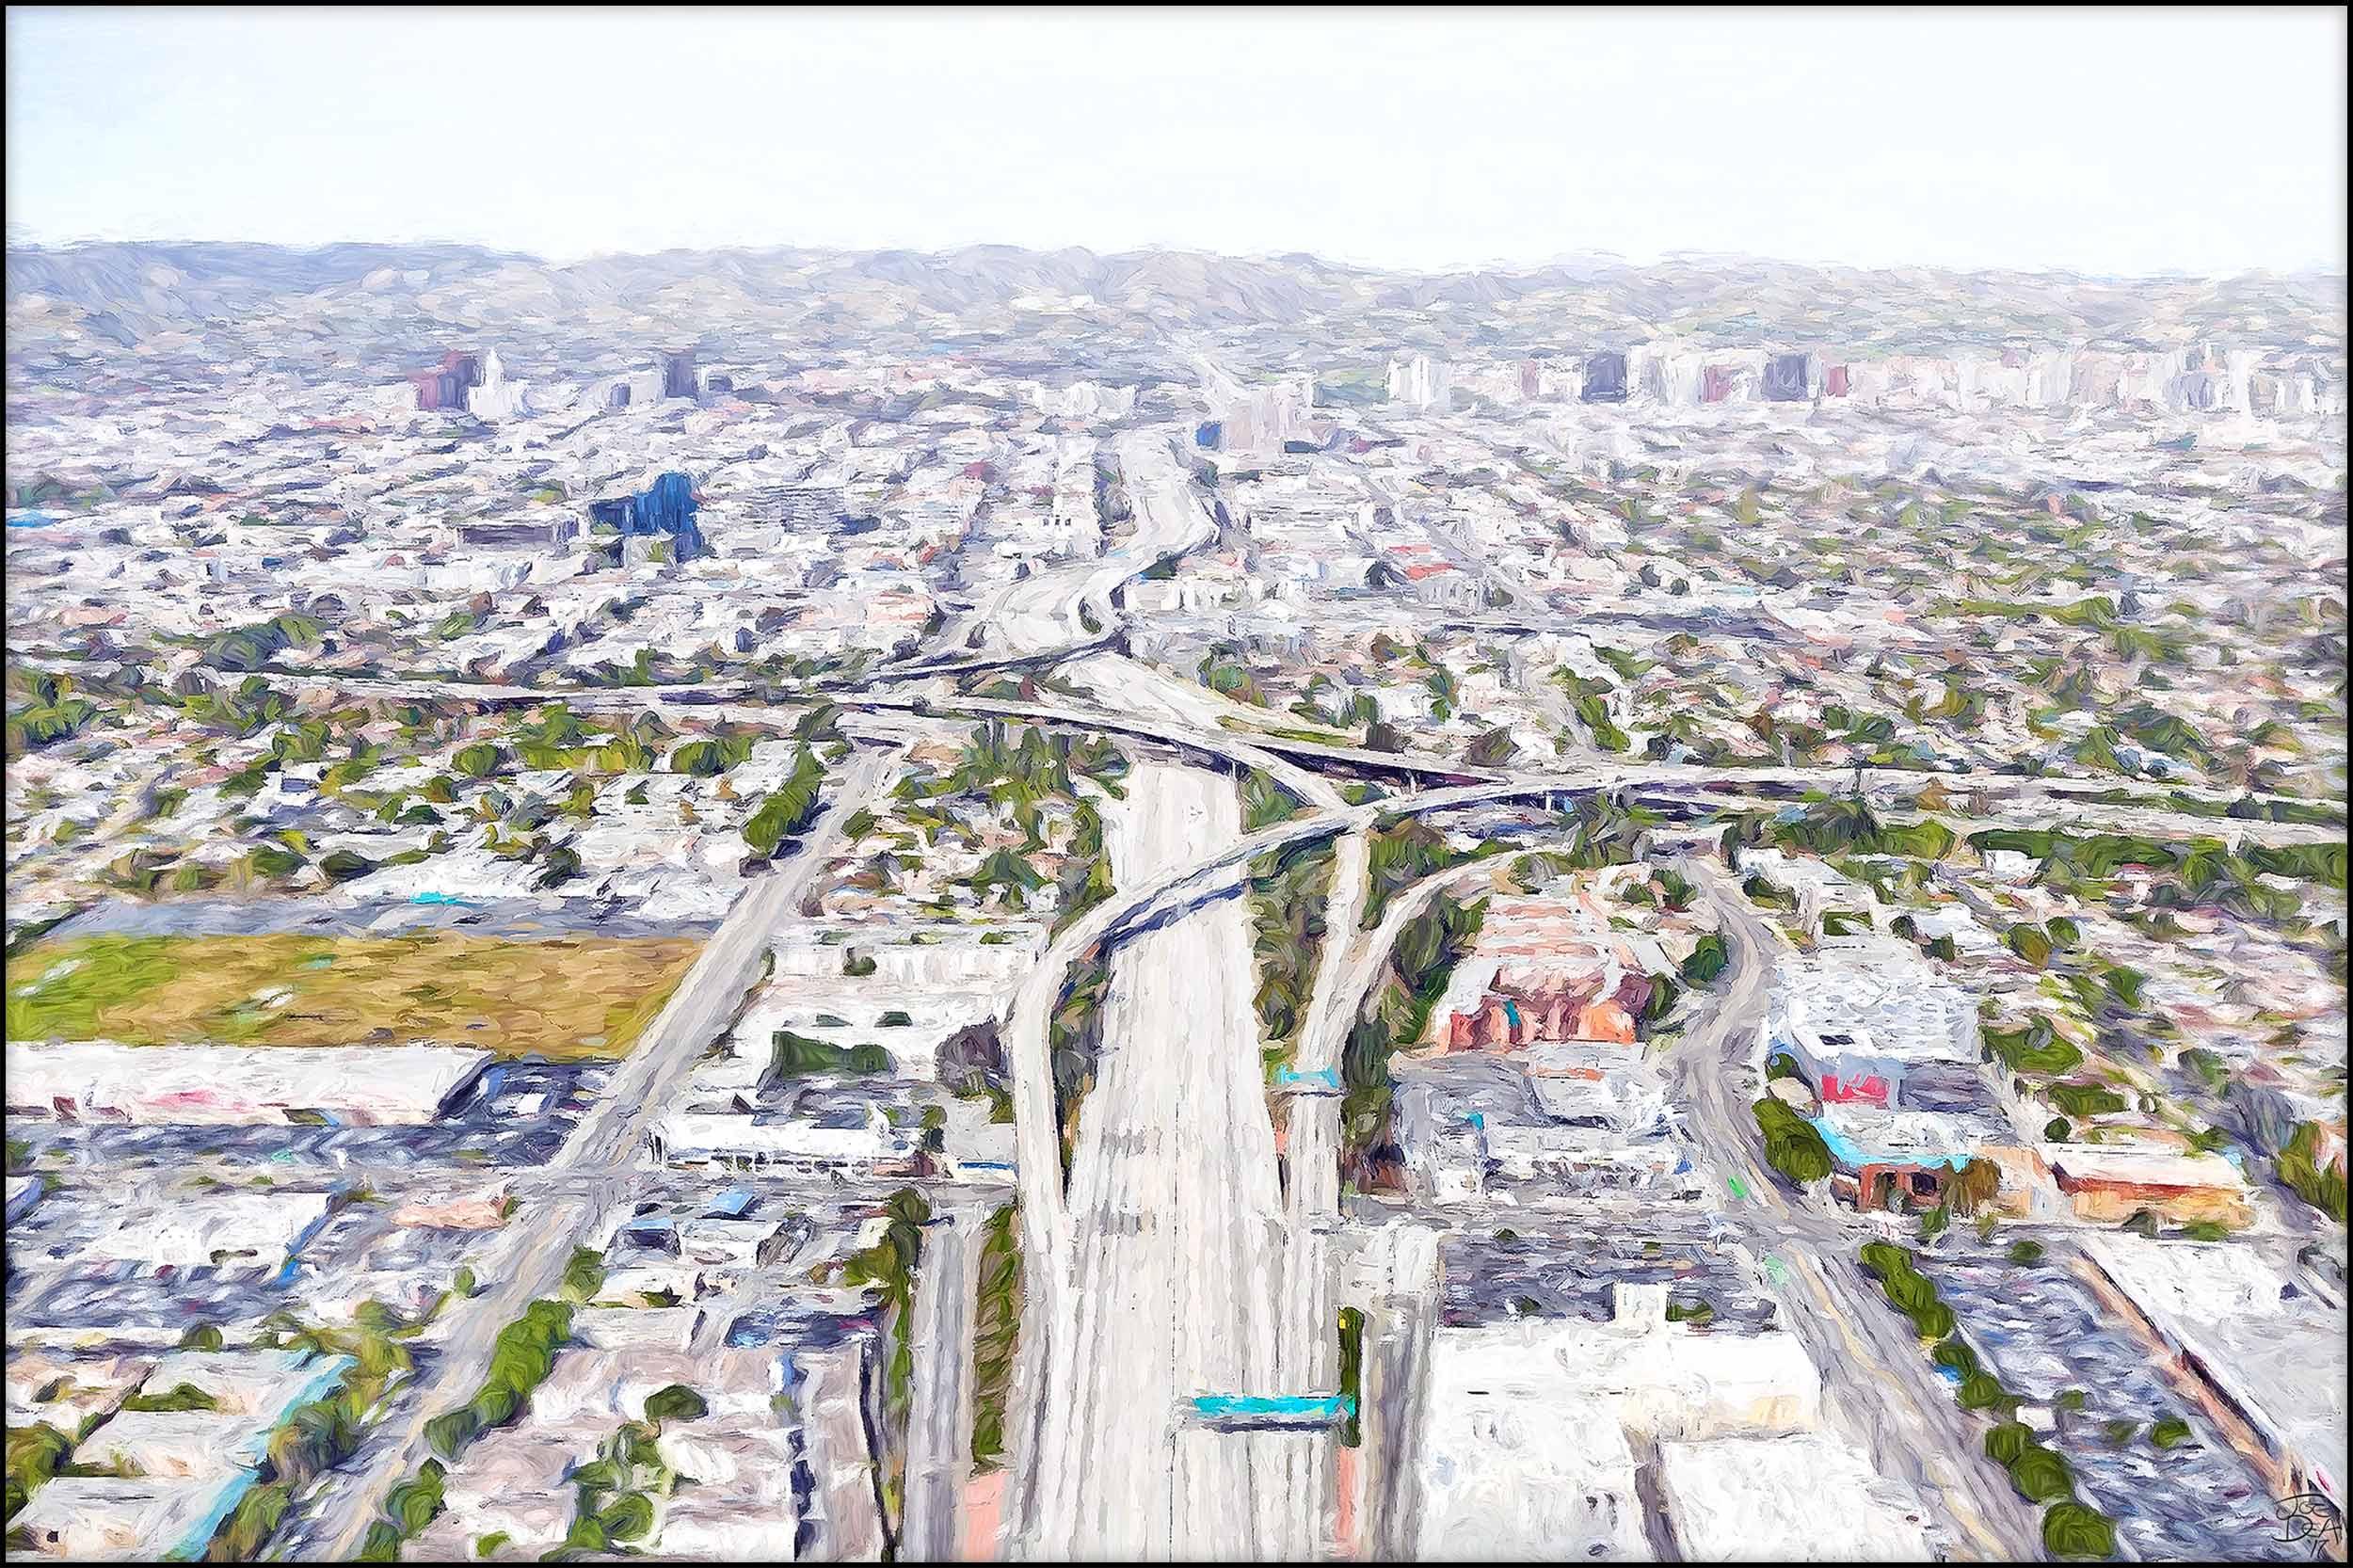 Los Angeles - 405 / 10 Interchange